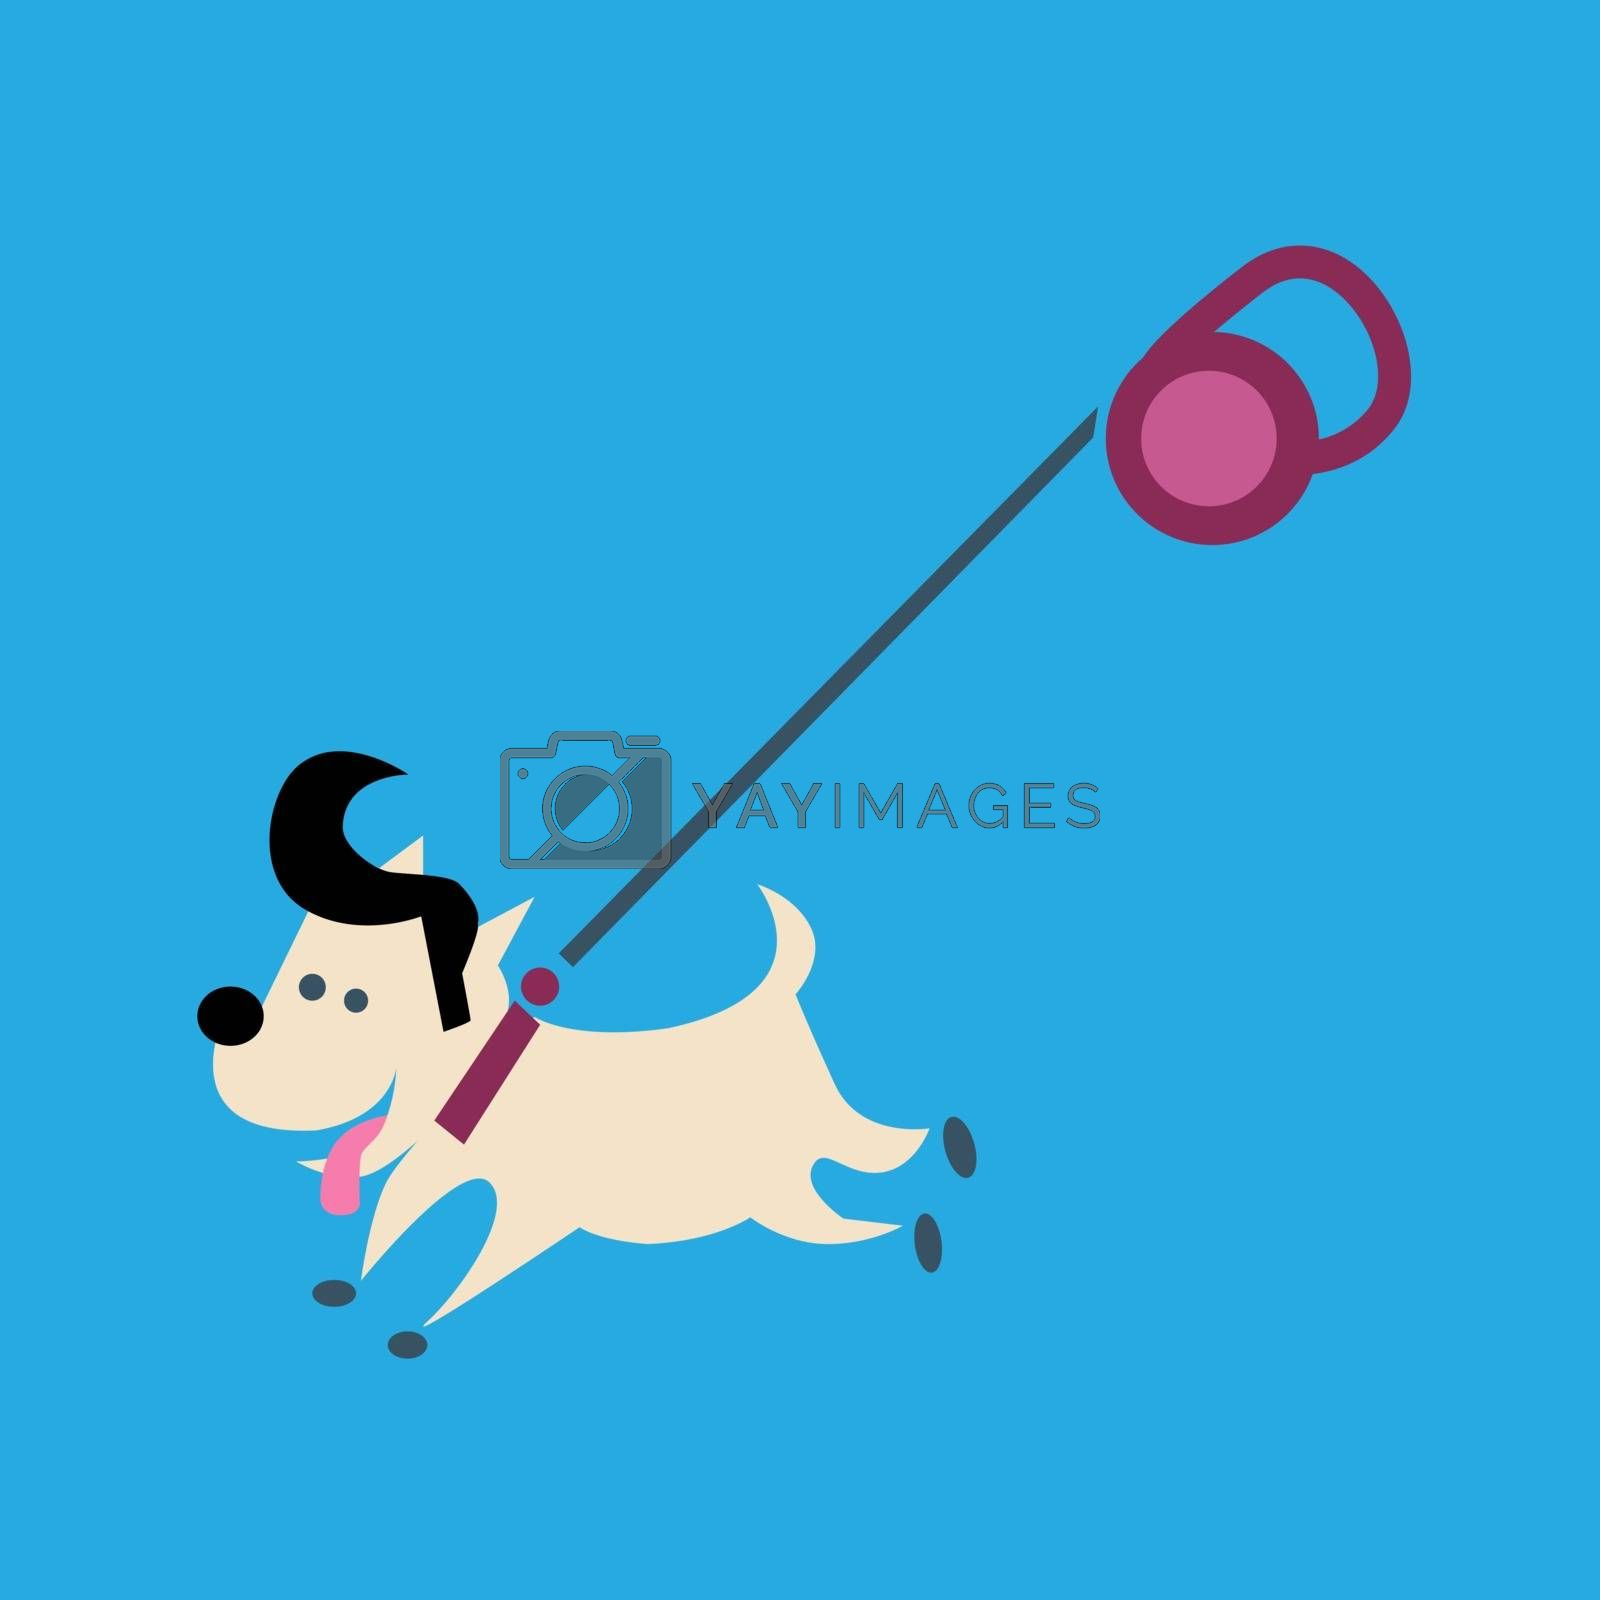 Little joyful fashionable dog on a leash. Walk